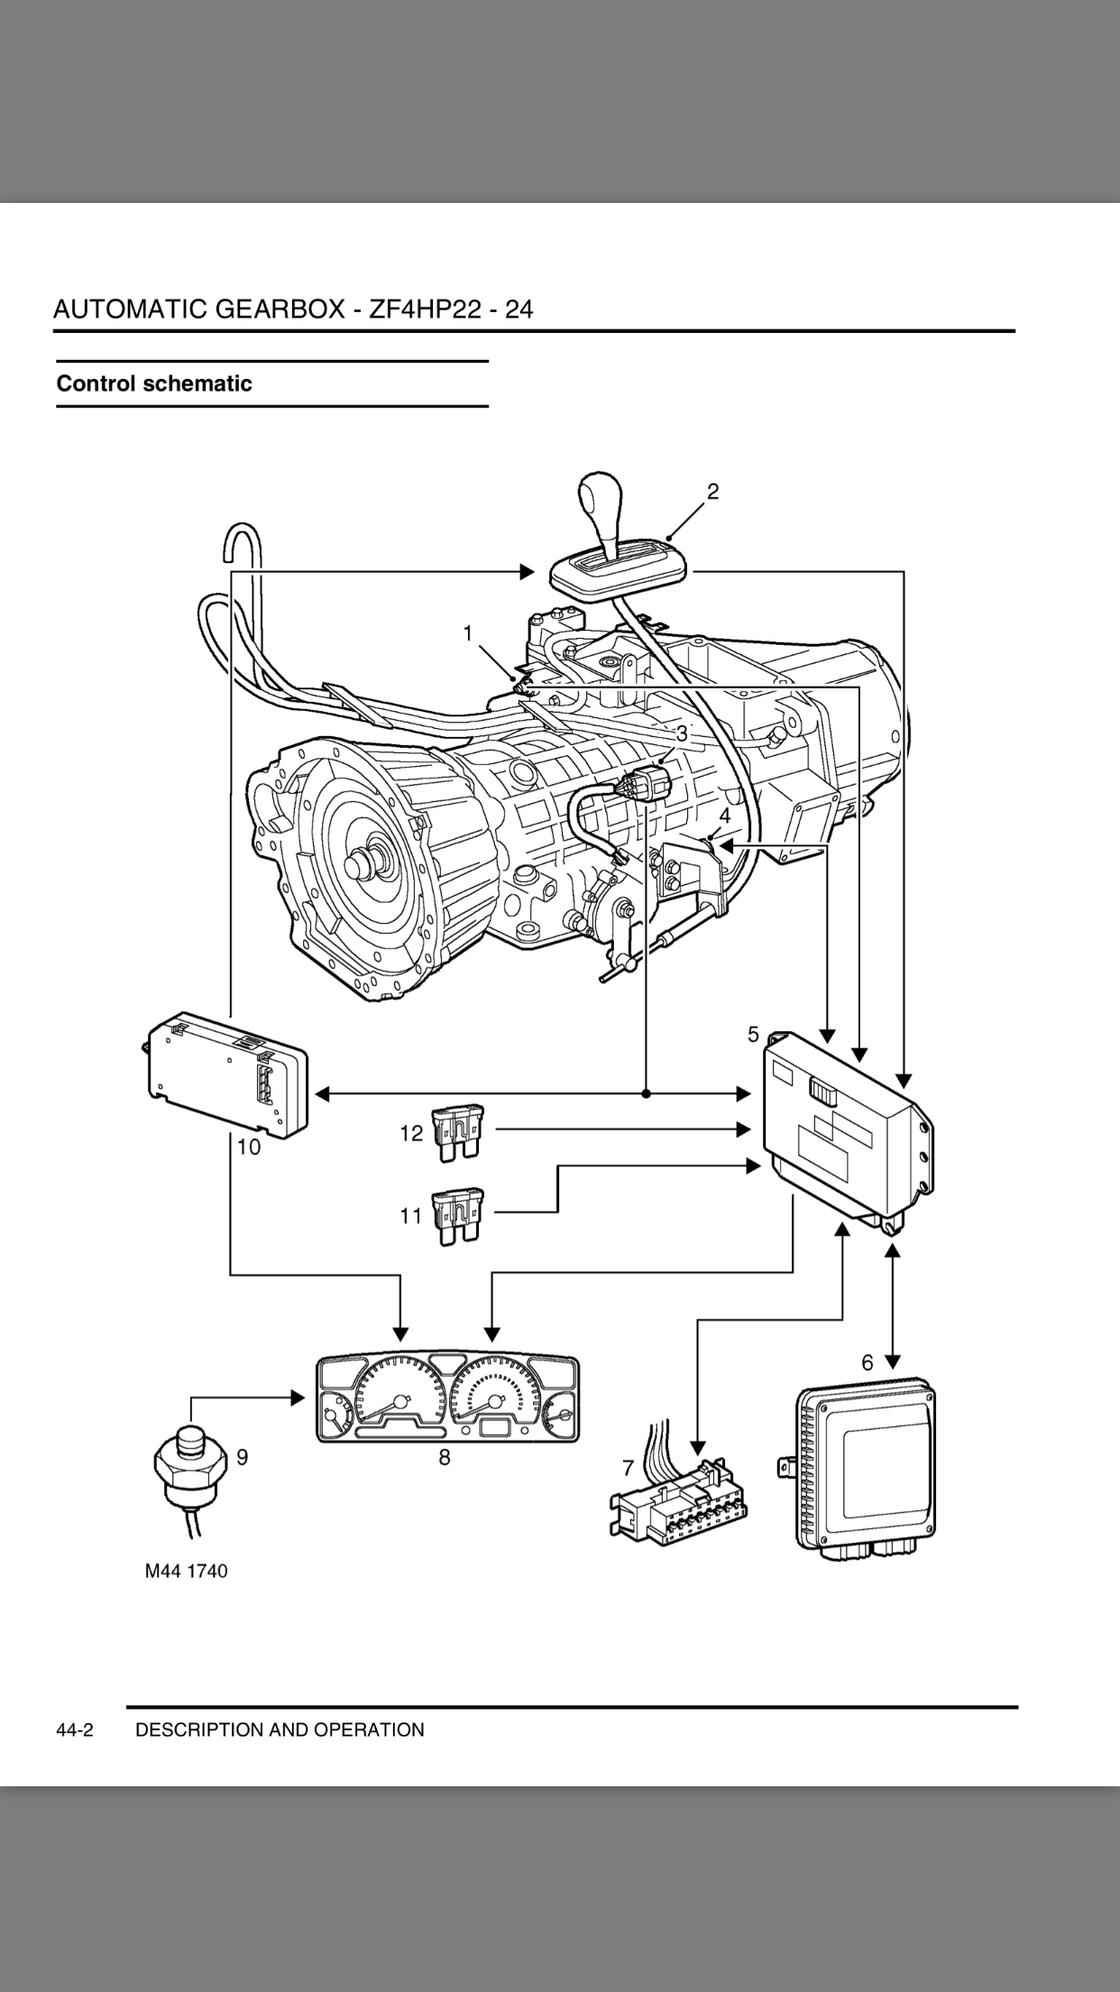 mazdaspeed6 engine diagram ge profile oven wiring diagram